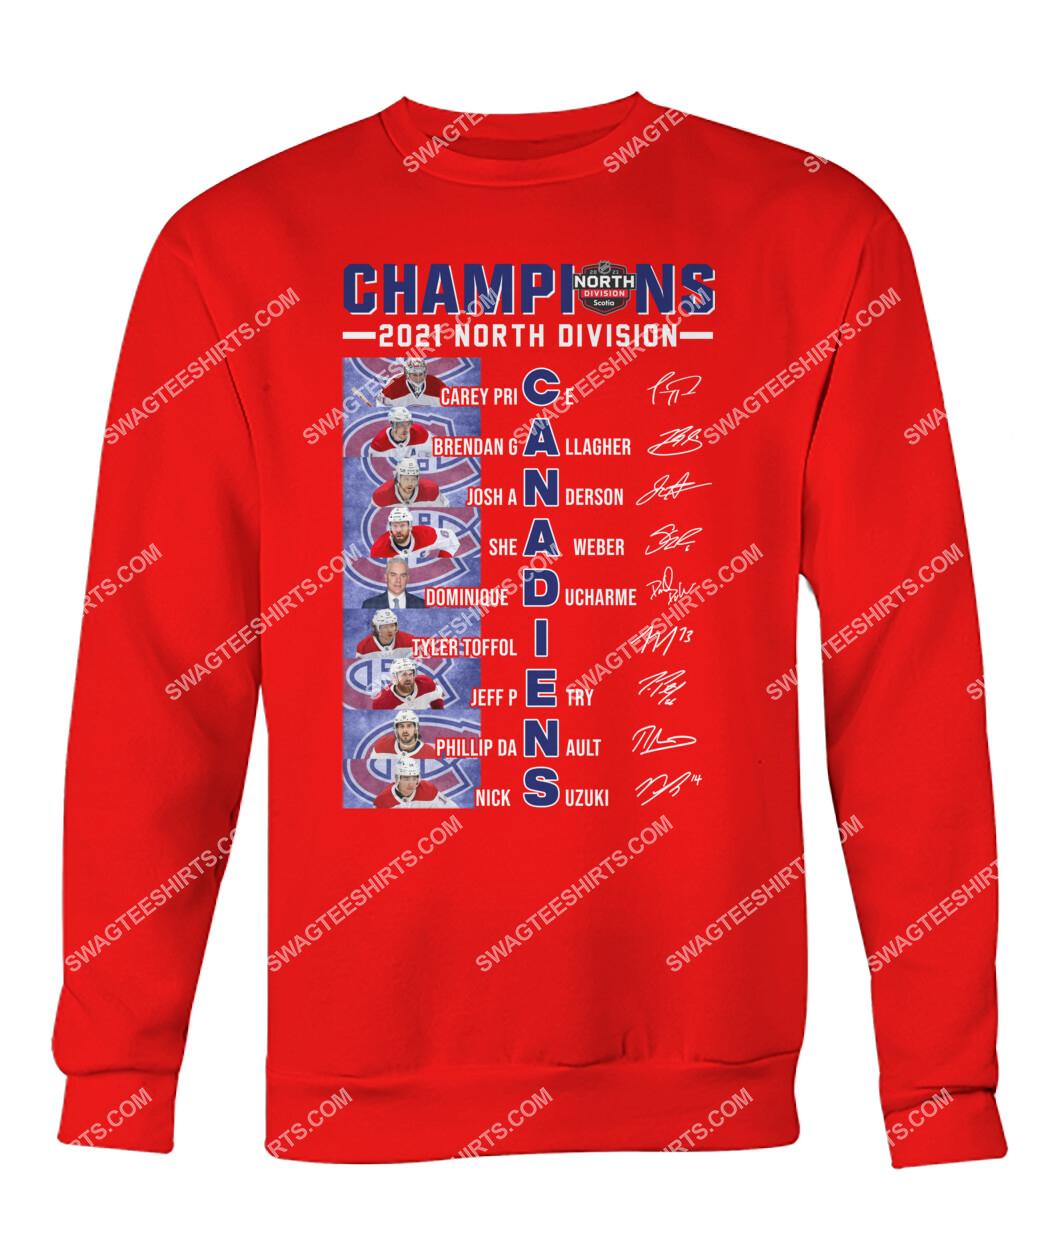 2021 north division champions montreal canadiens signatures sweatshirt 1